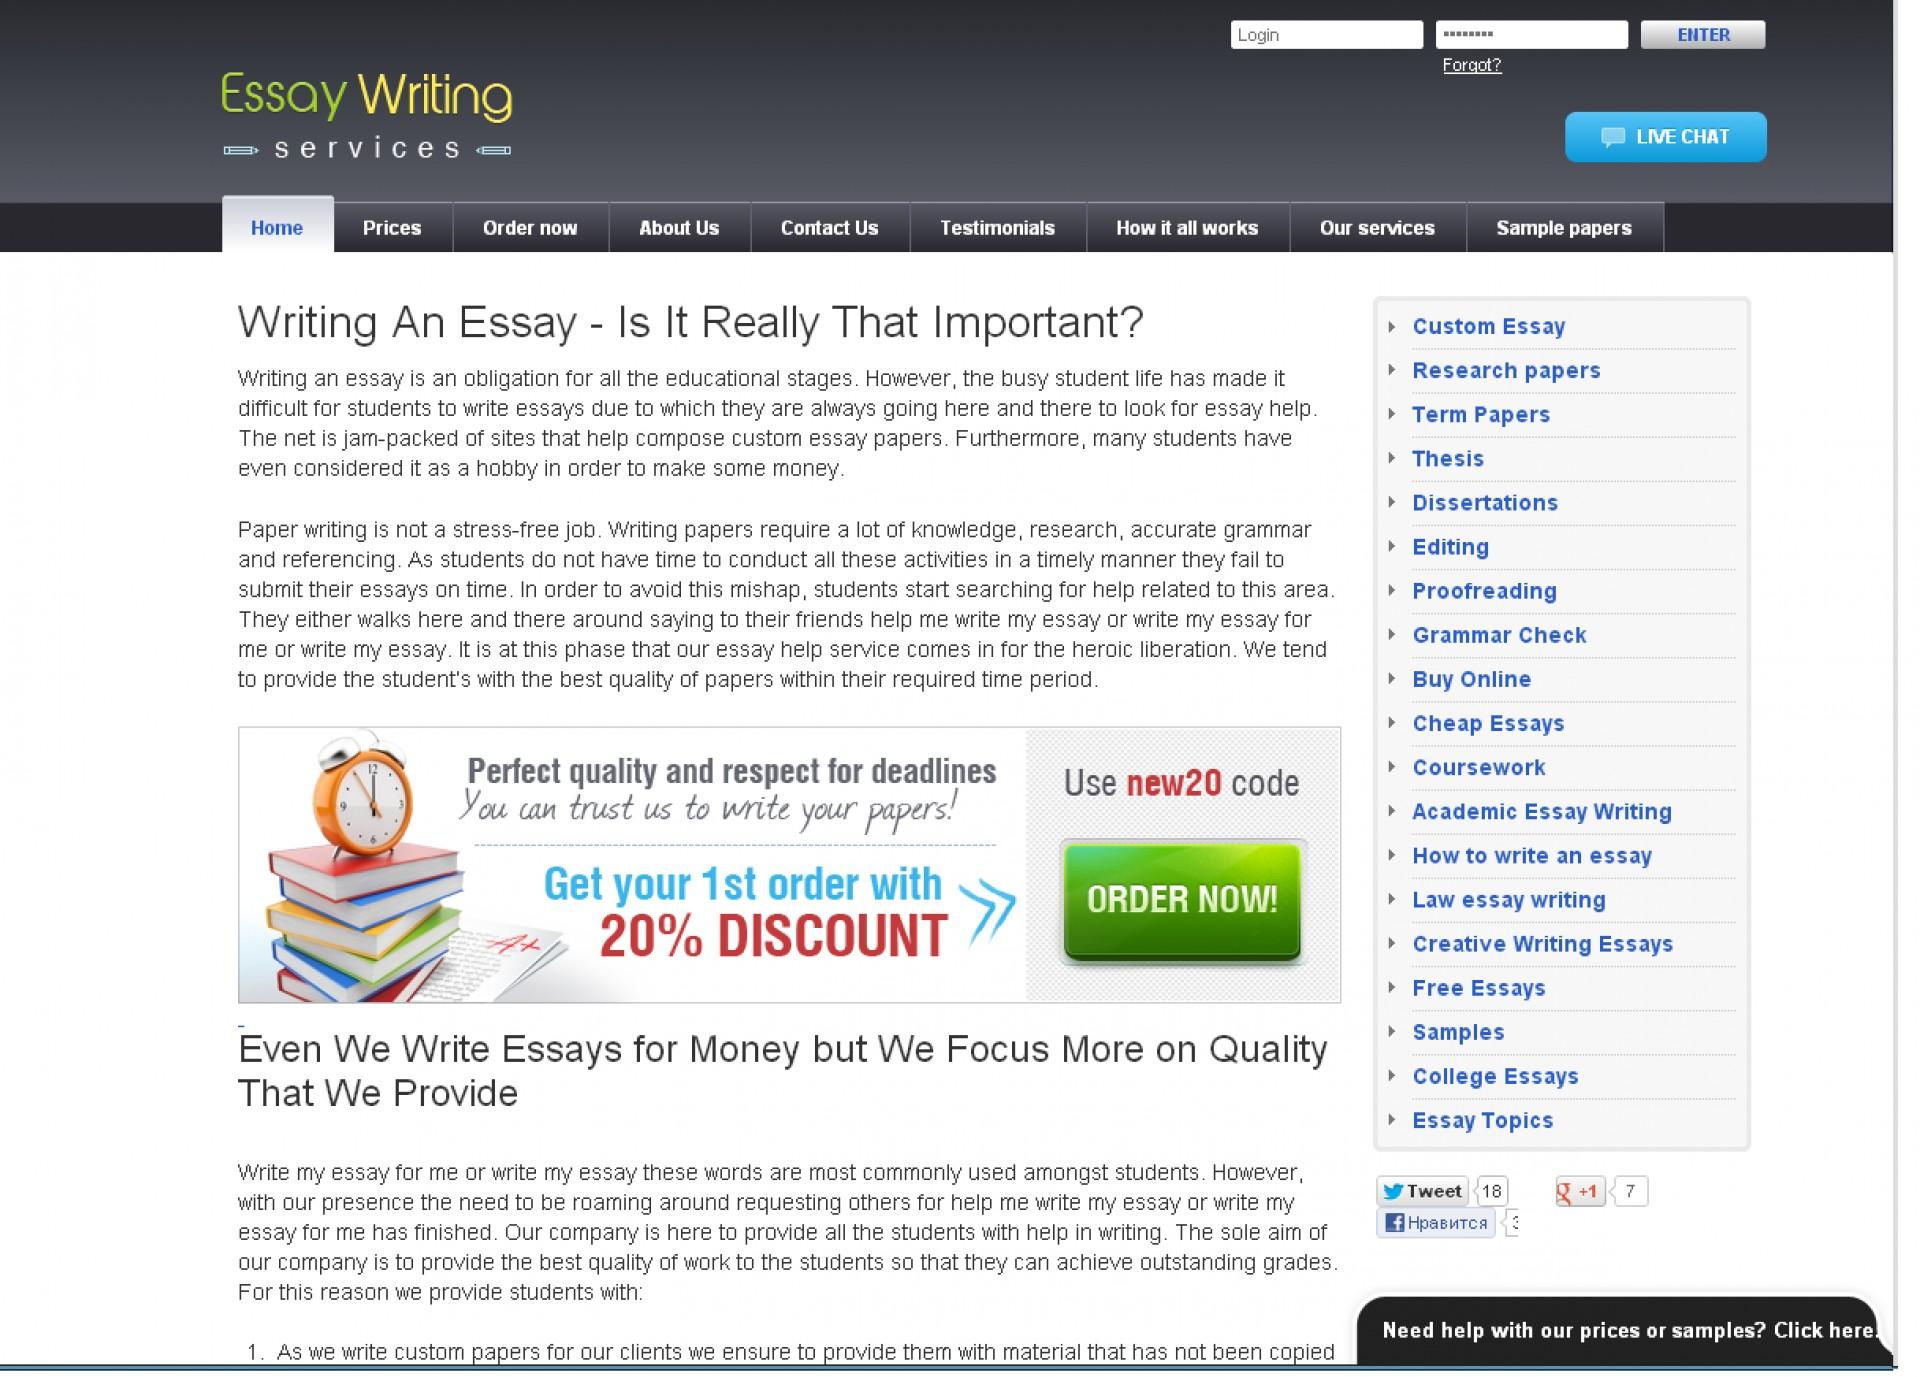 005 Essay Example Writing Service Reviews 1879000414 Singular Pro Uk Top 1920